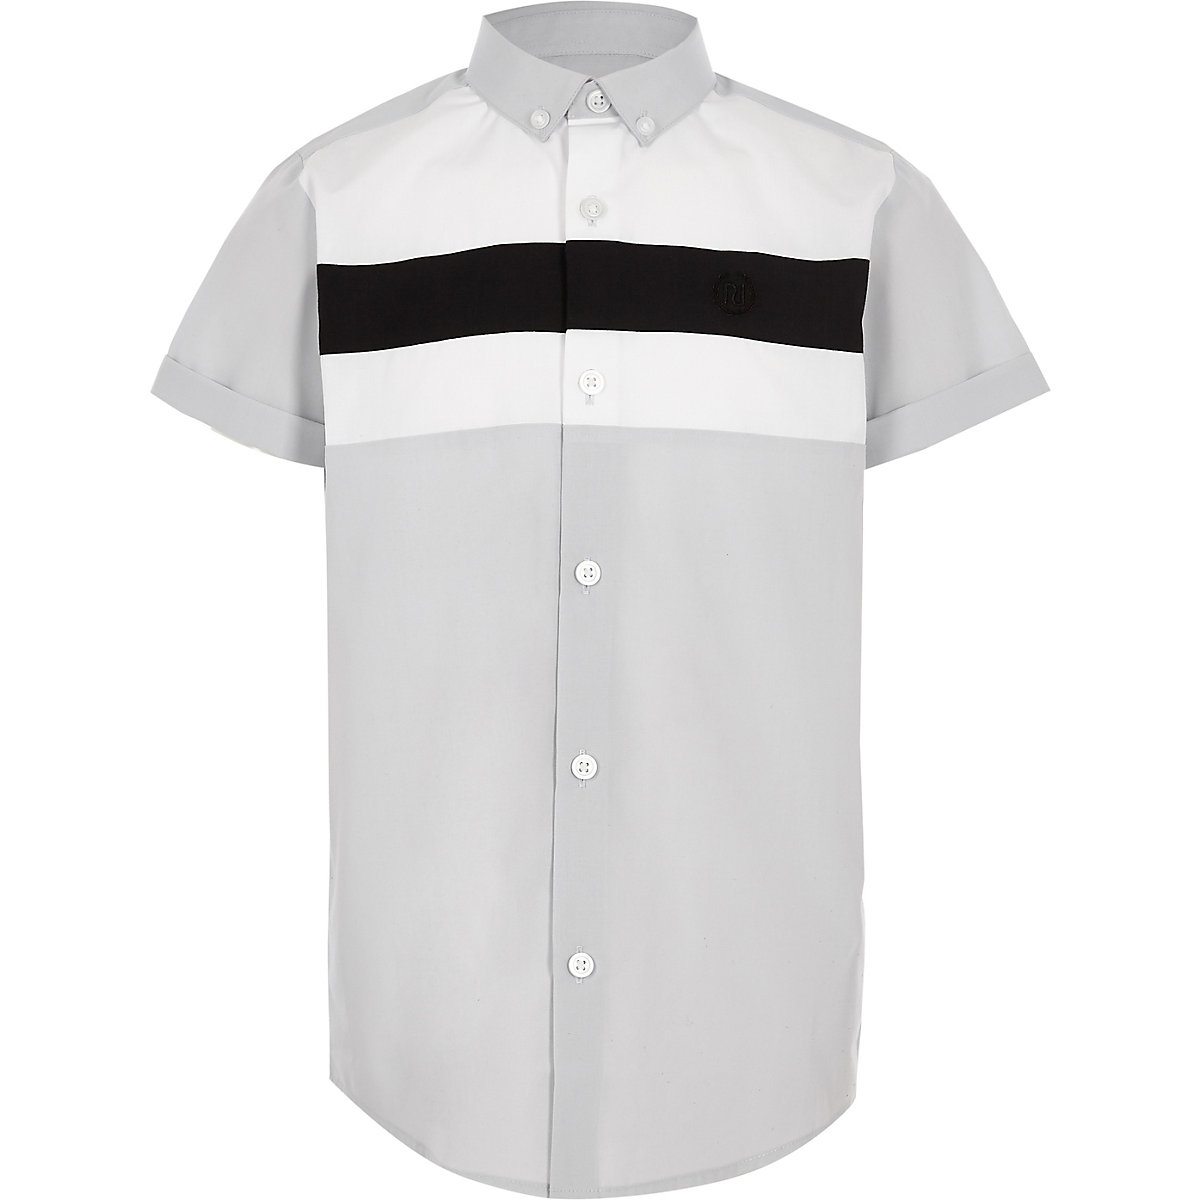 Boys grey short sleeve contrast shirt